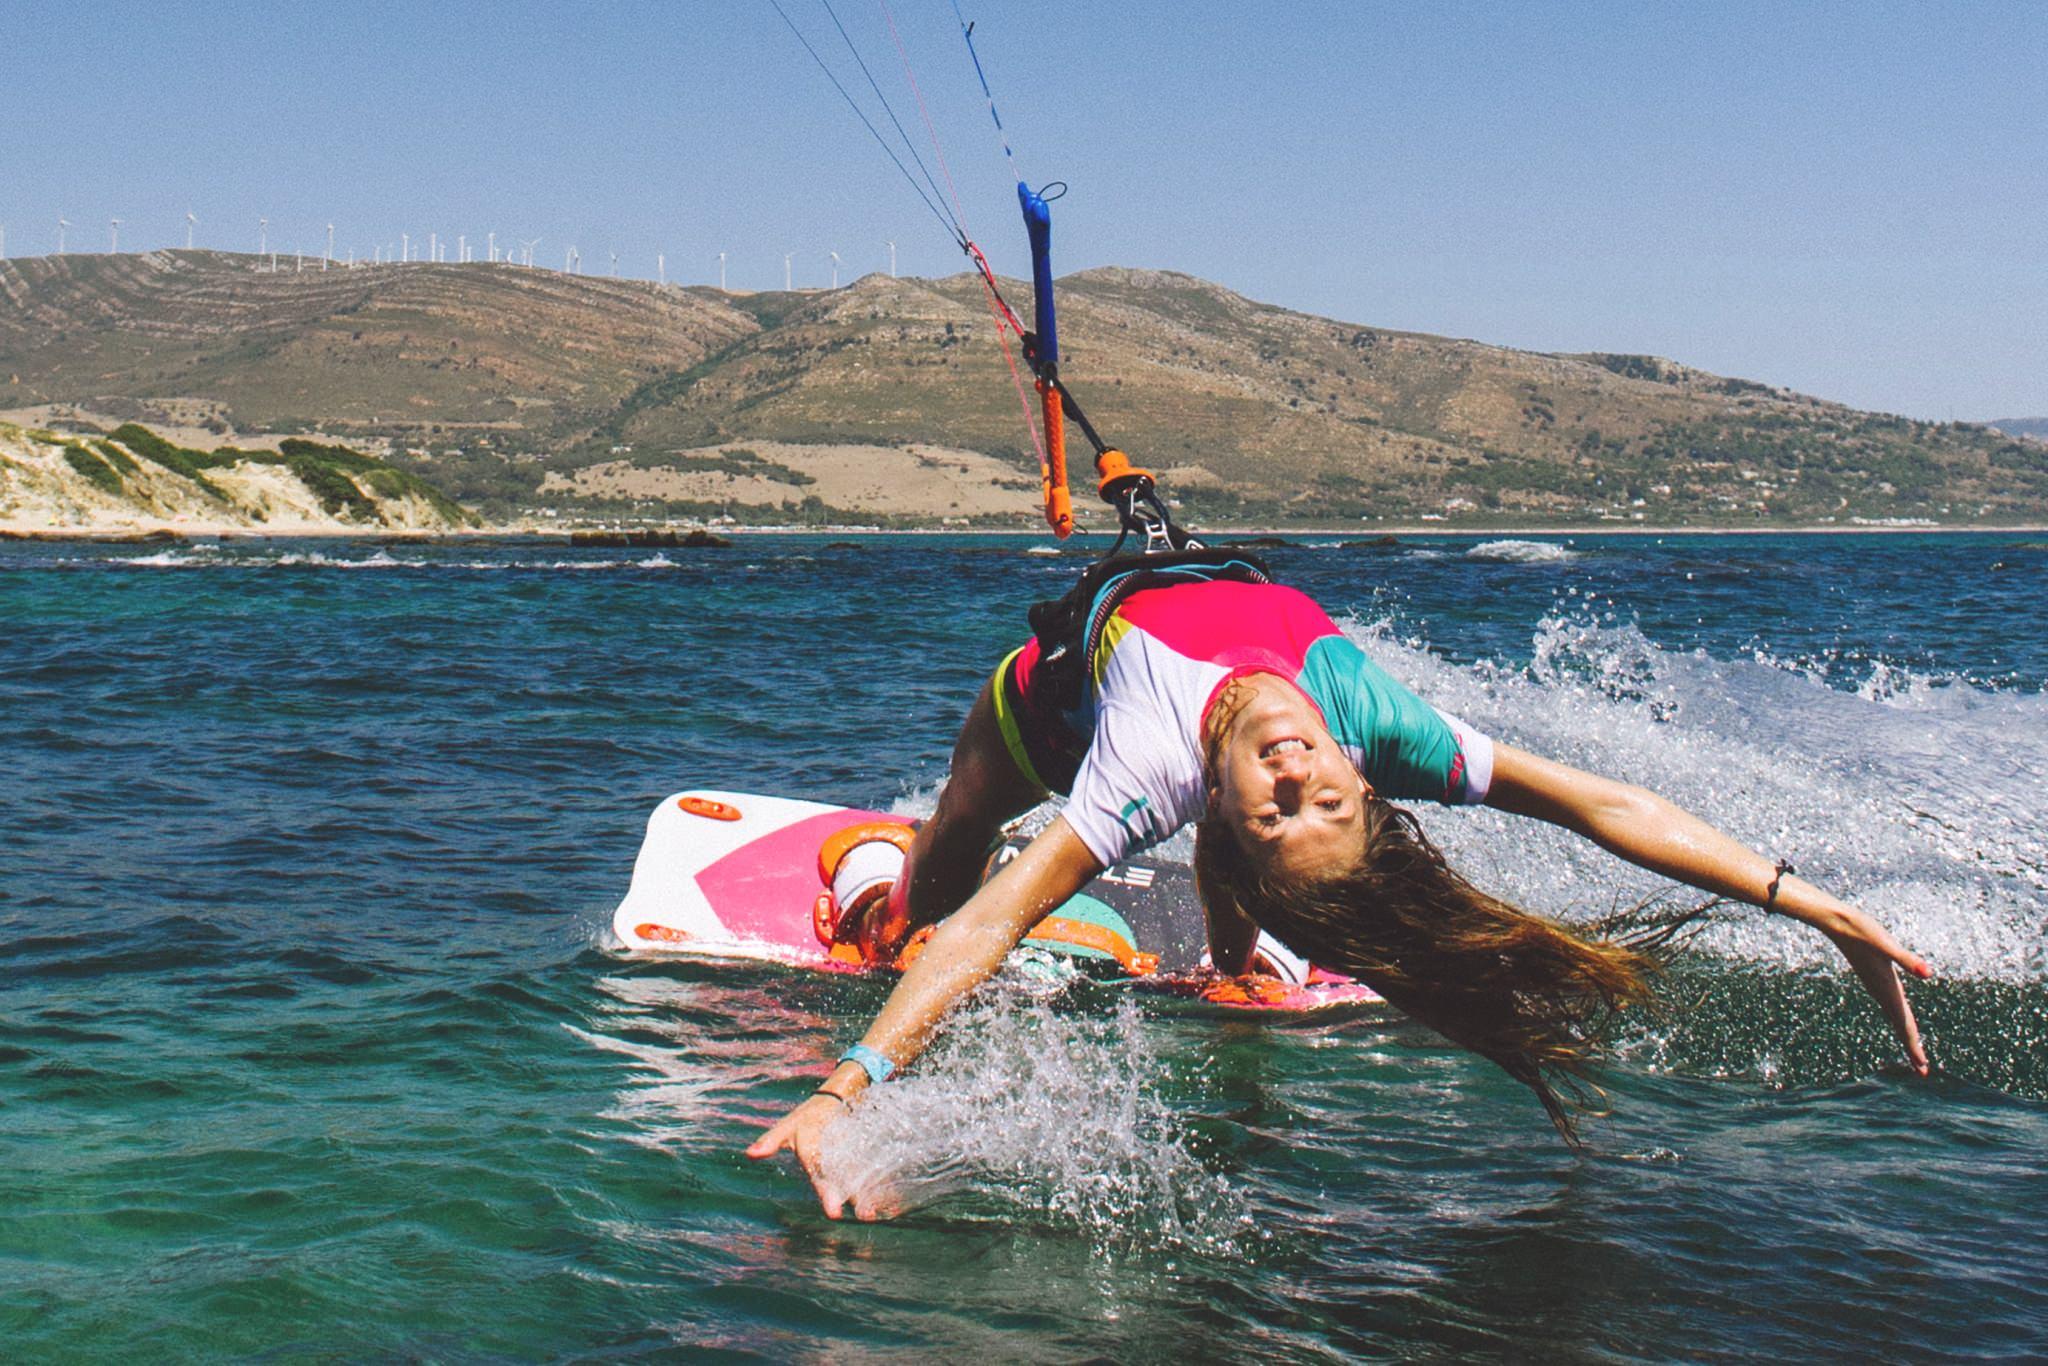 kurs-kitesurfingu-szkoła-kitecrew